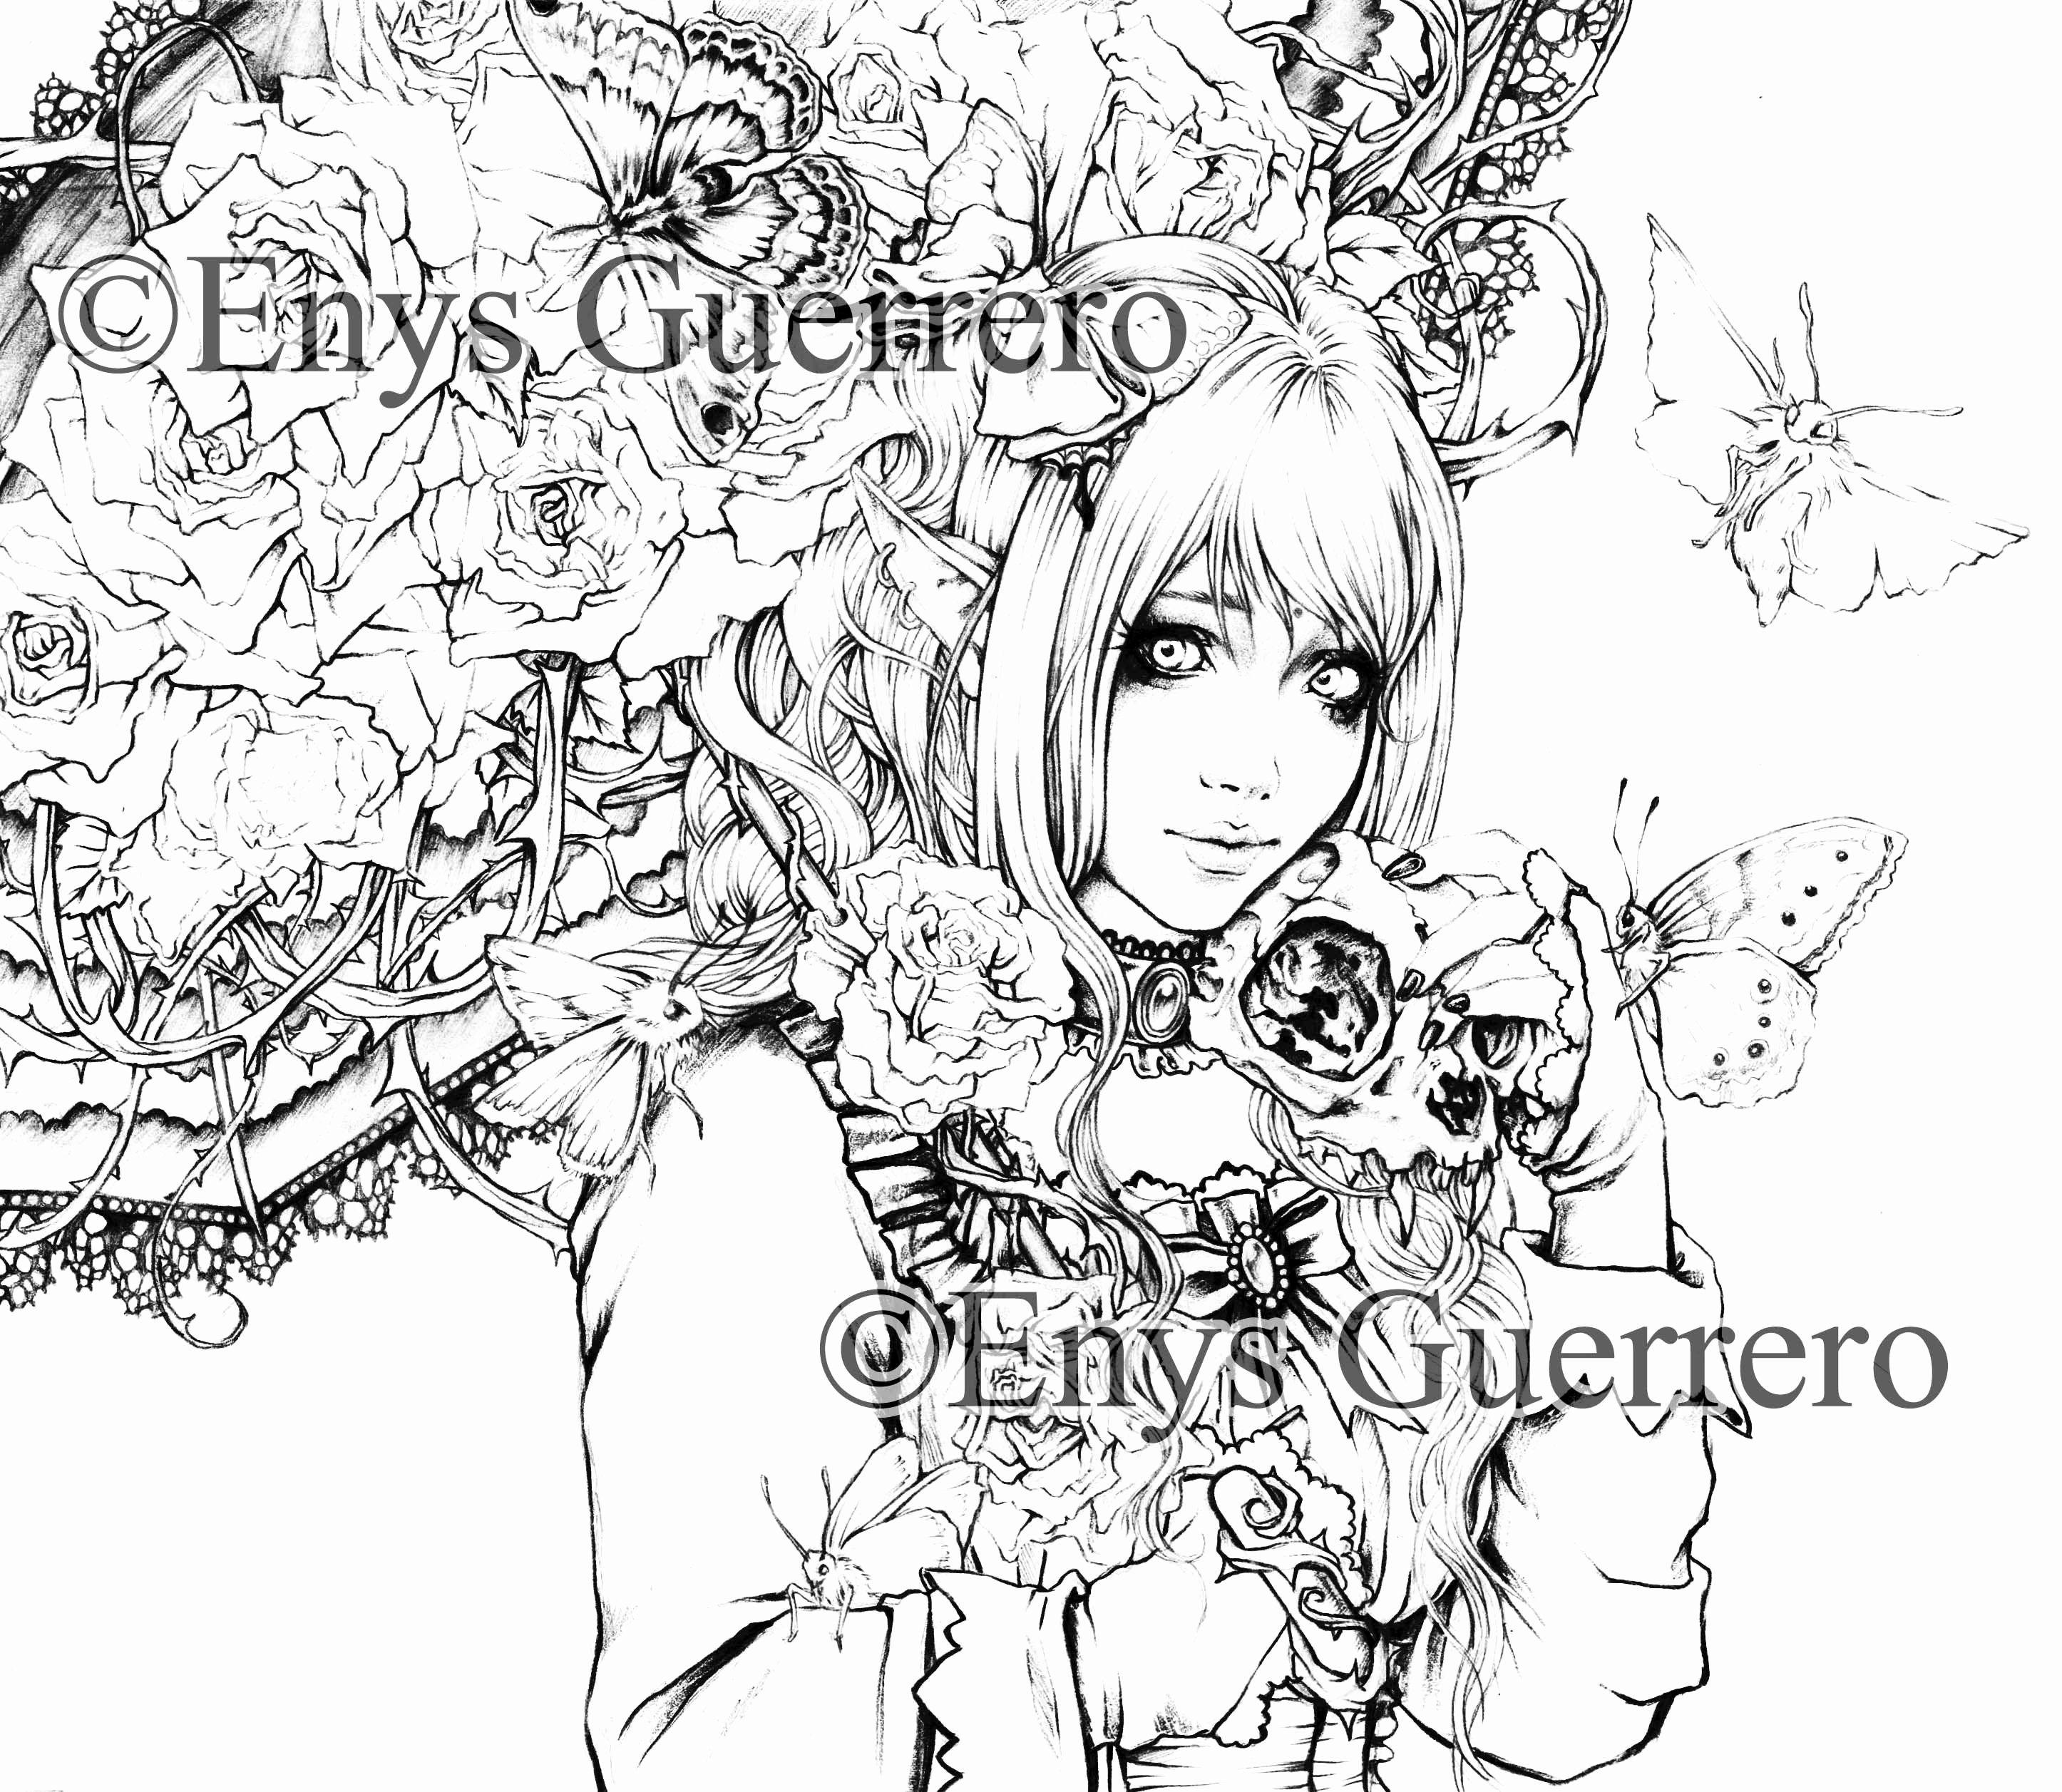 American Gothic Coloring Page Luxury Dark Elf Coloring Page Goth Fantasy Printable Download By Enys Guerrero [ 2514 x 2892 Pixel ]